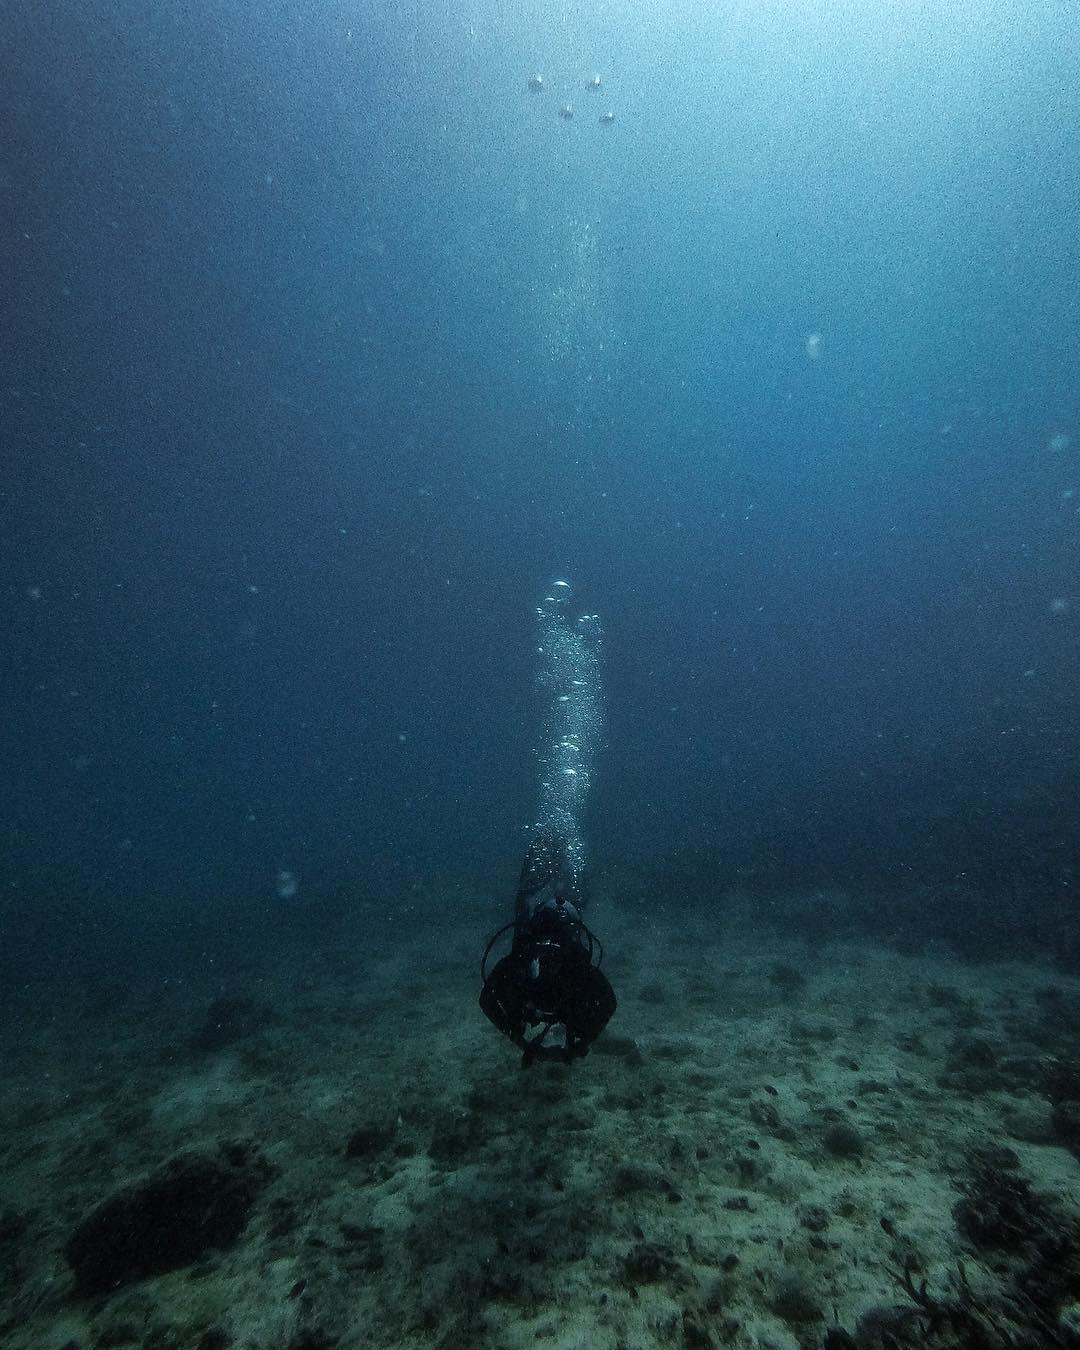 Antara hasil gambar Hero 7 ketika di dasar laut.